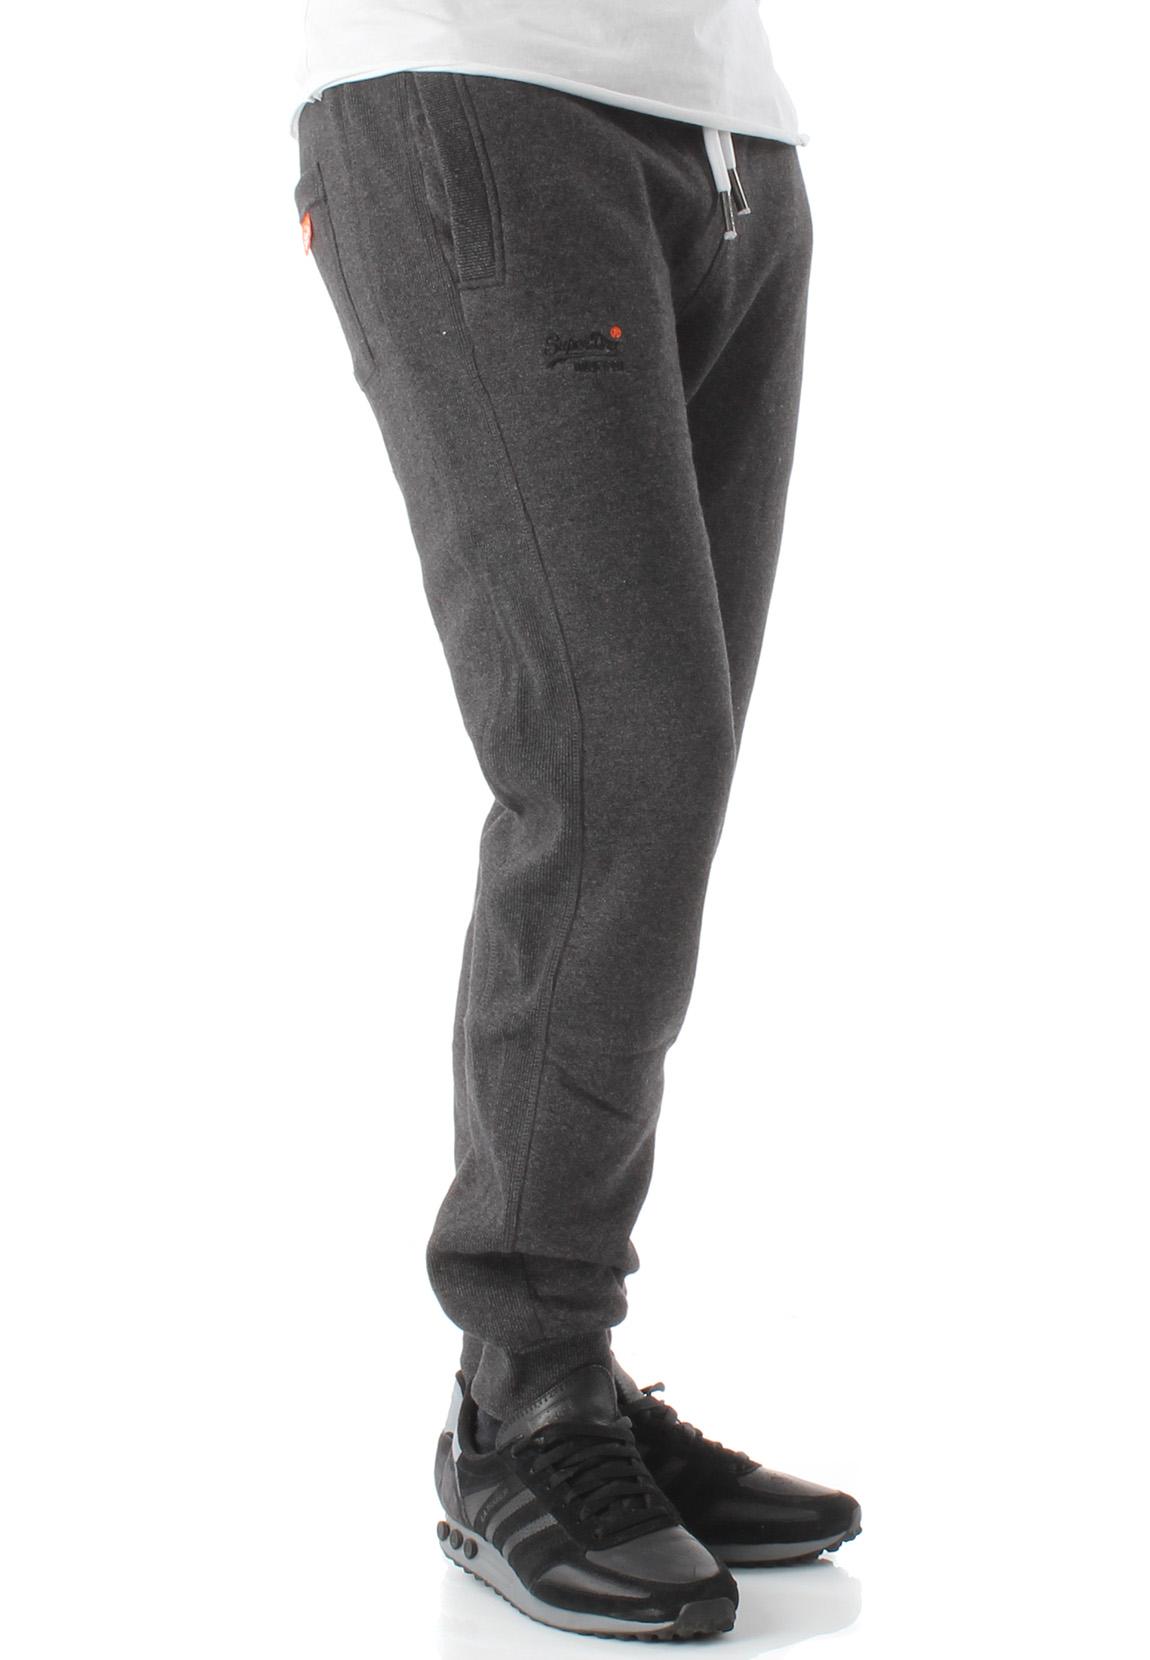 check out 98507 73fb5 Details about Superdry Jogginghose Men Orange Label Cuffed Jogger Low Light  Black Grit